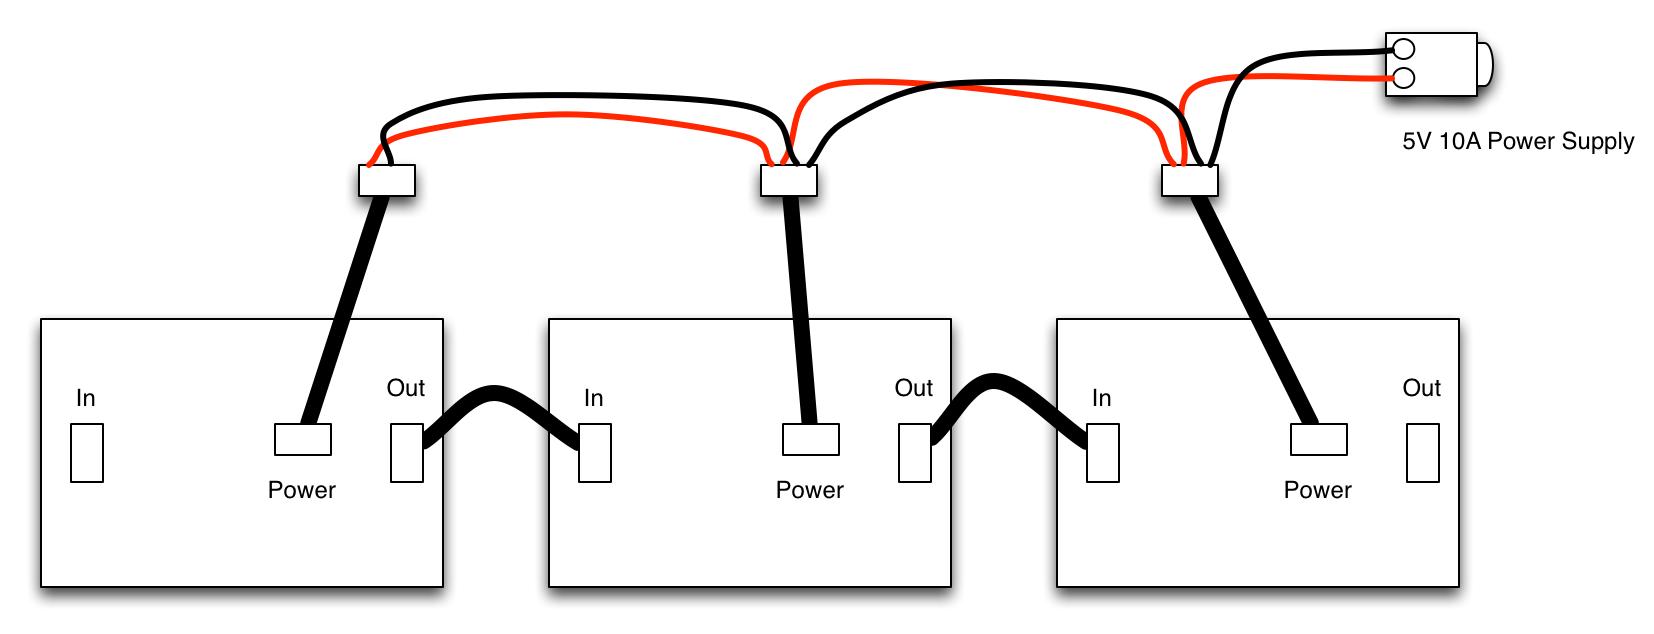 Adafruit Learning System